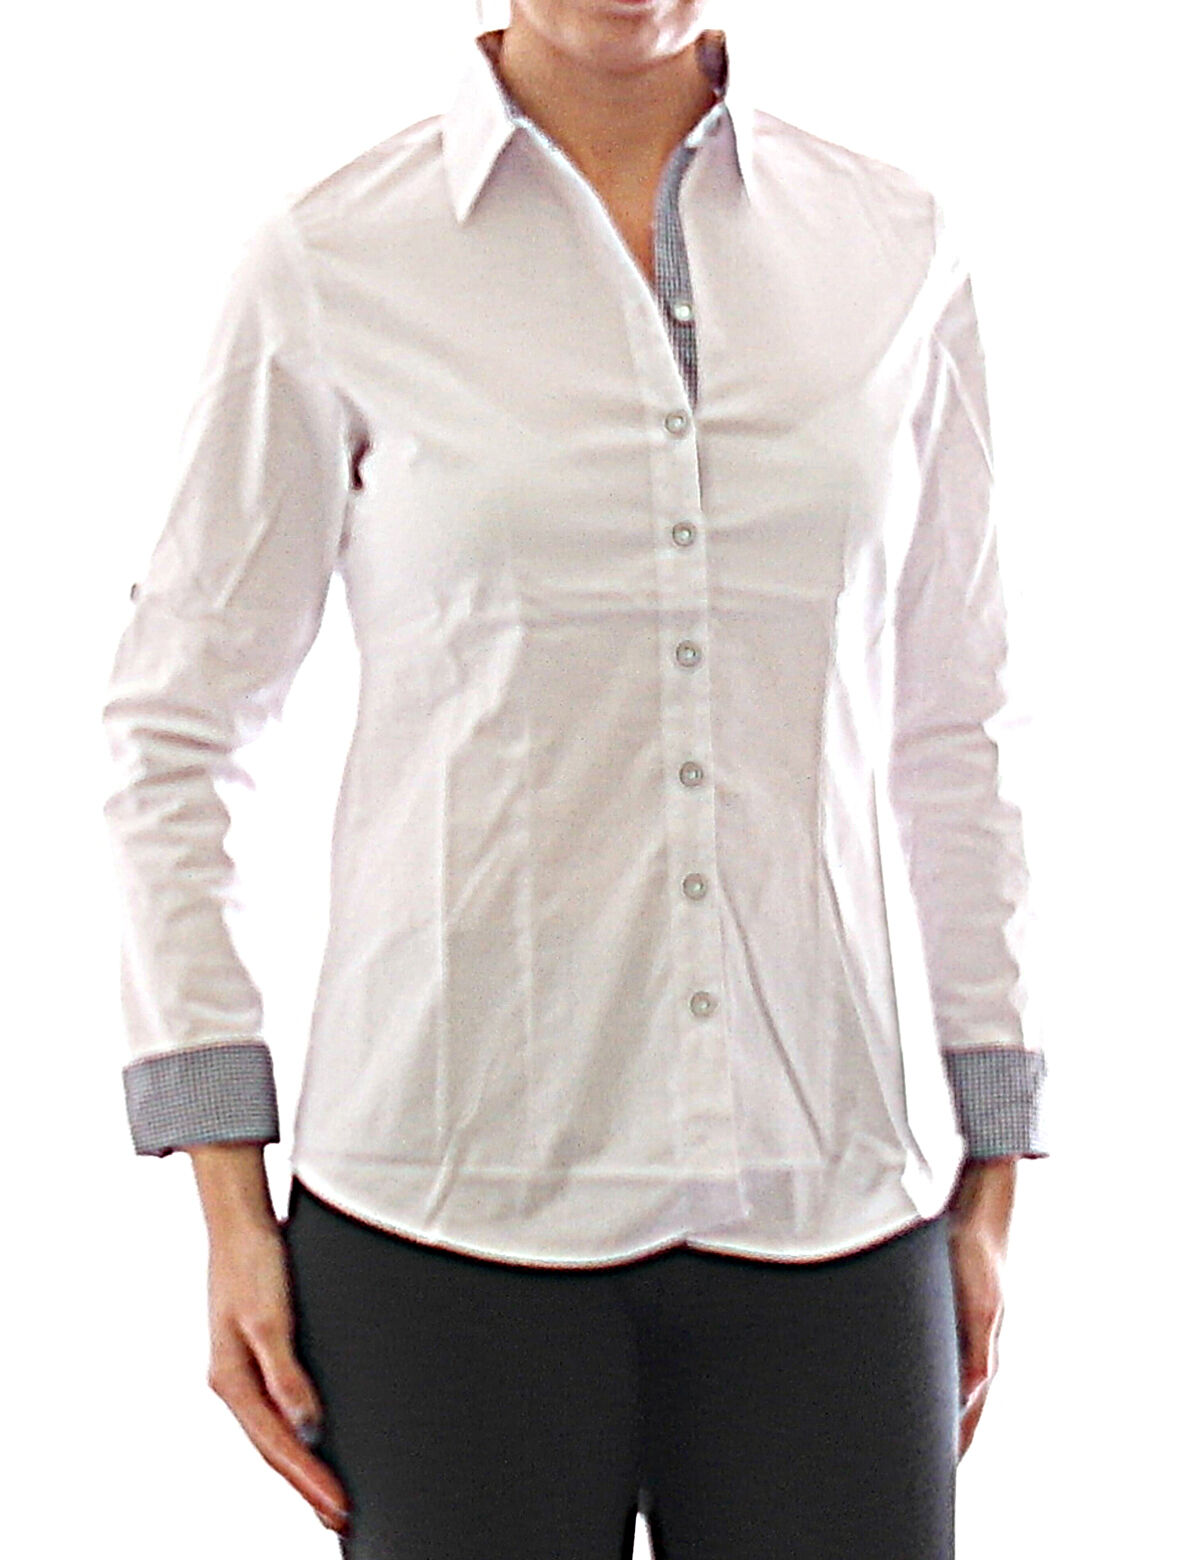 lowest price 3aa7d ec014 Damen Bluse Hemd Langarm Shirt Tunika Business Weiß Baumwolle 349